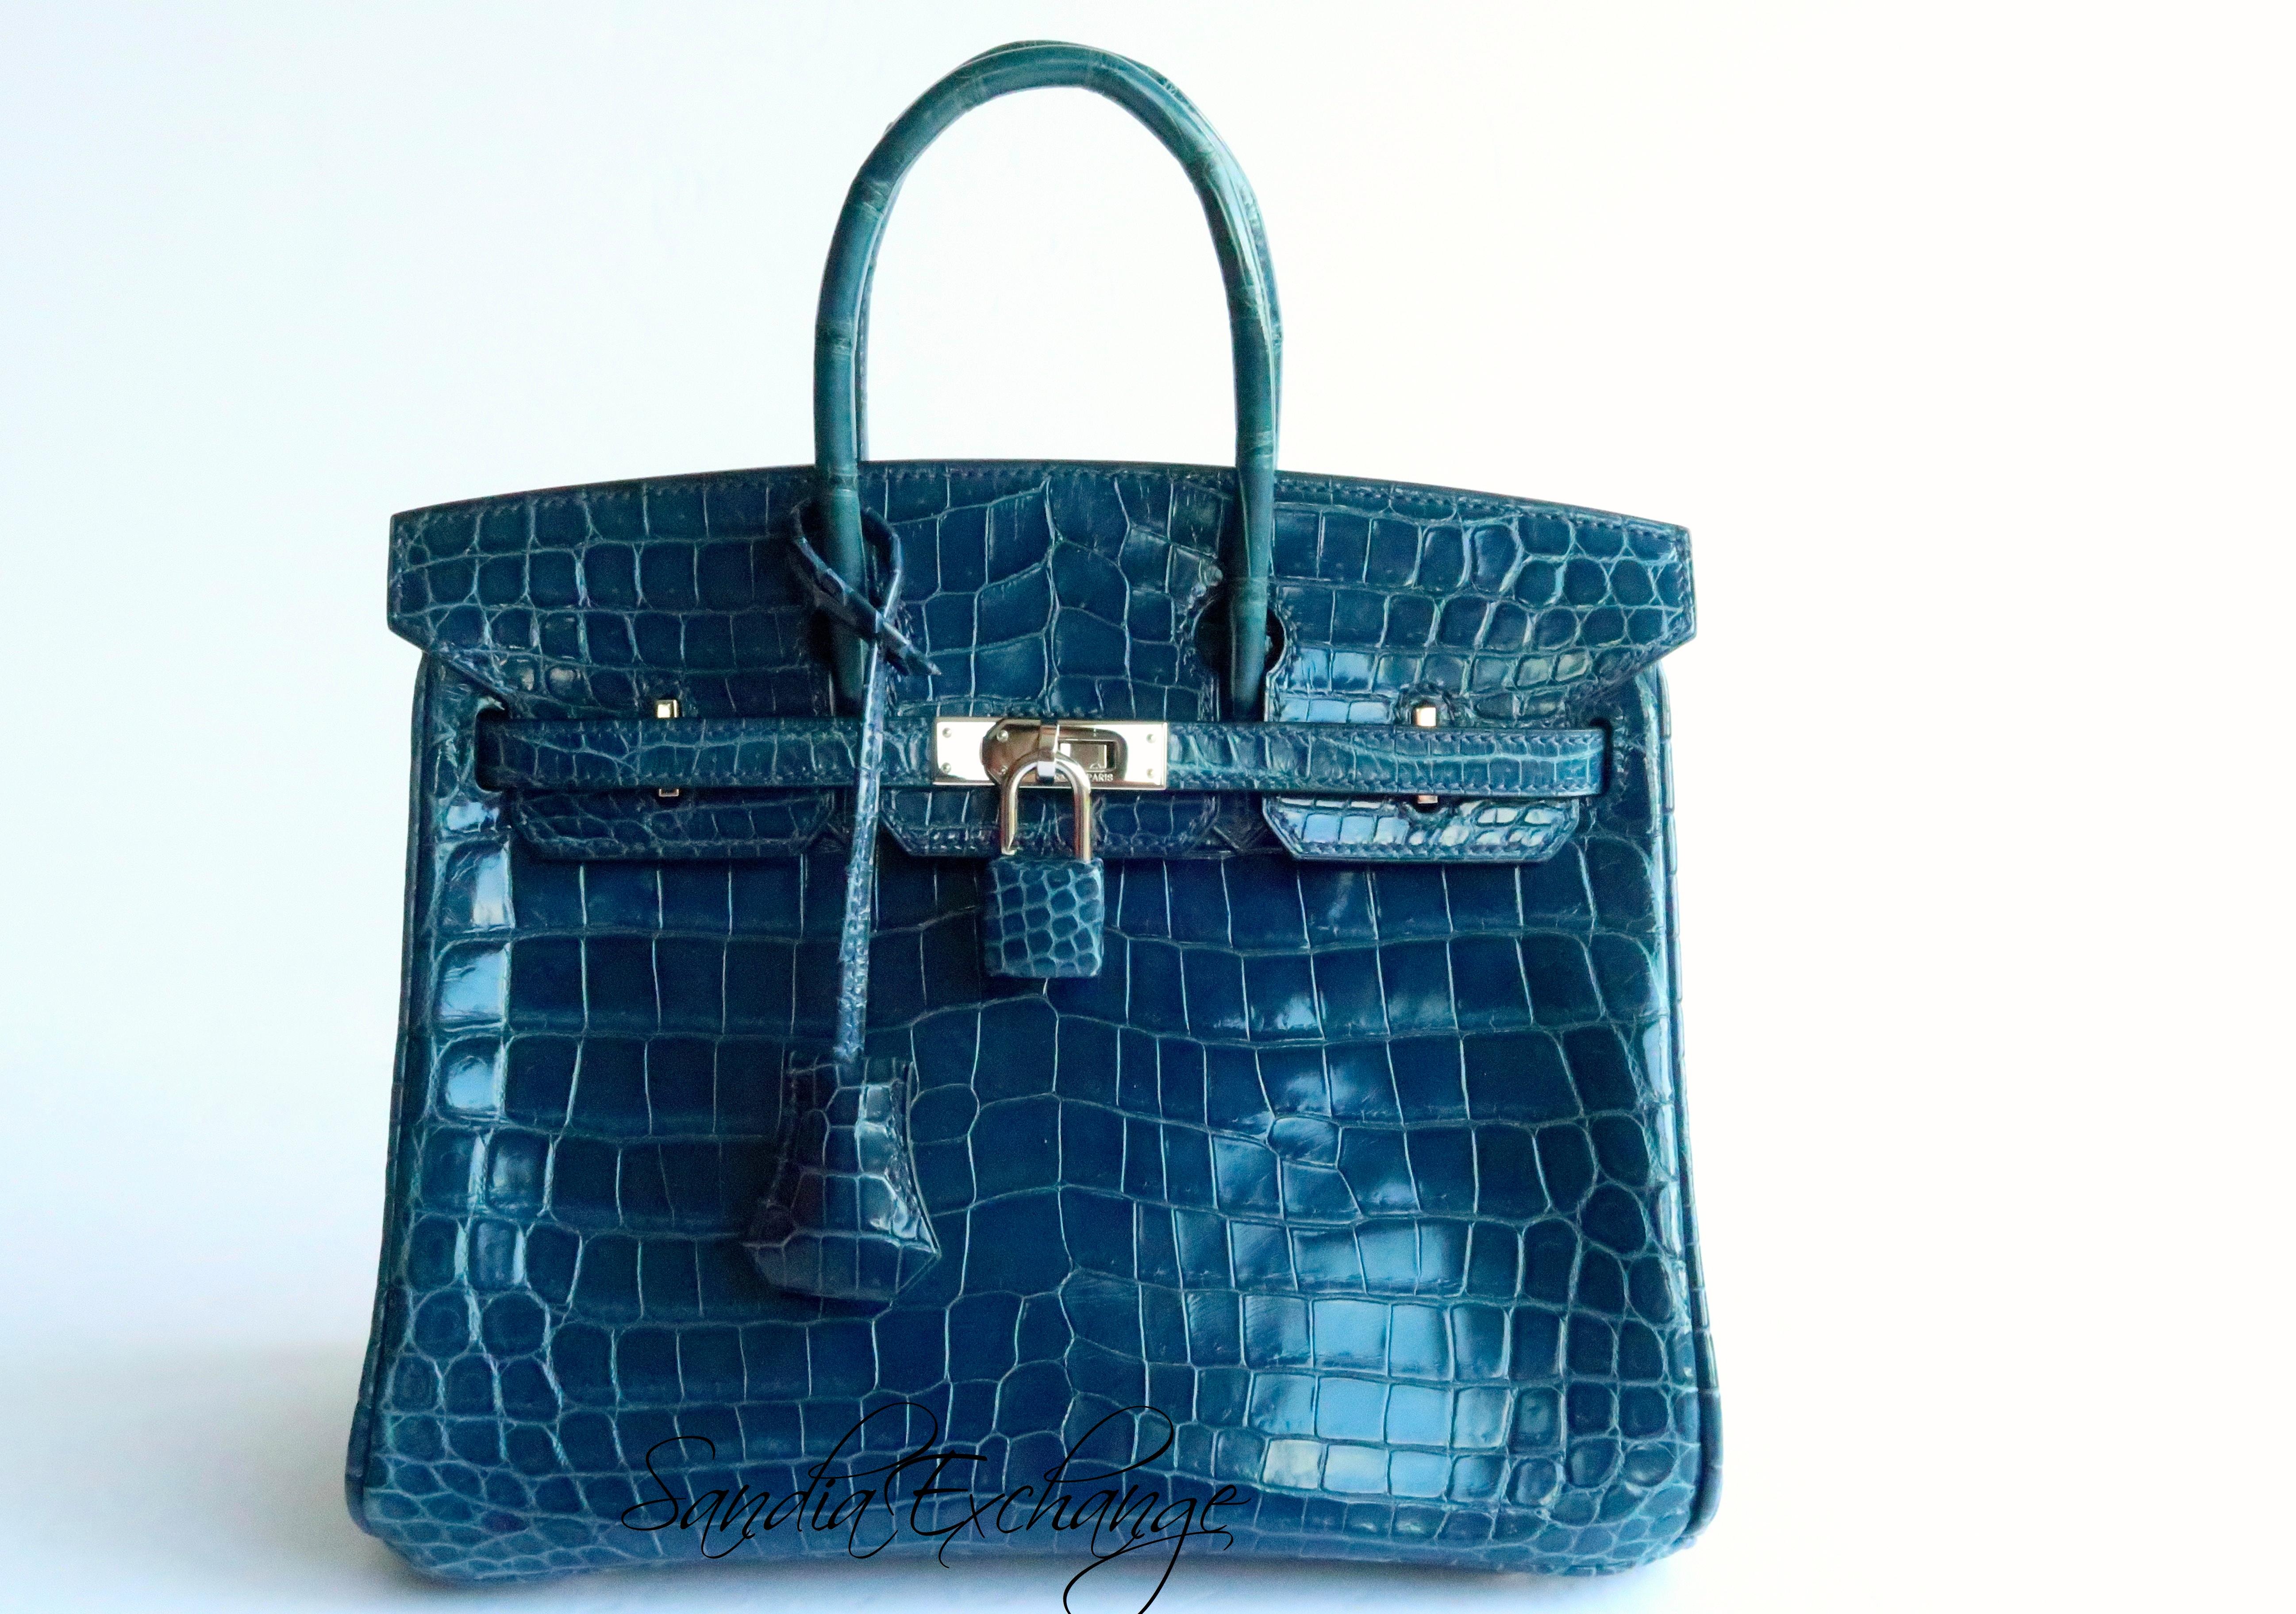 Authentic HERMES Shiny BLUE Crocodile Birkin 25 cm Palladium Hardware ... ff4e76597bd6b